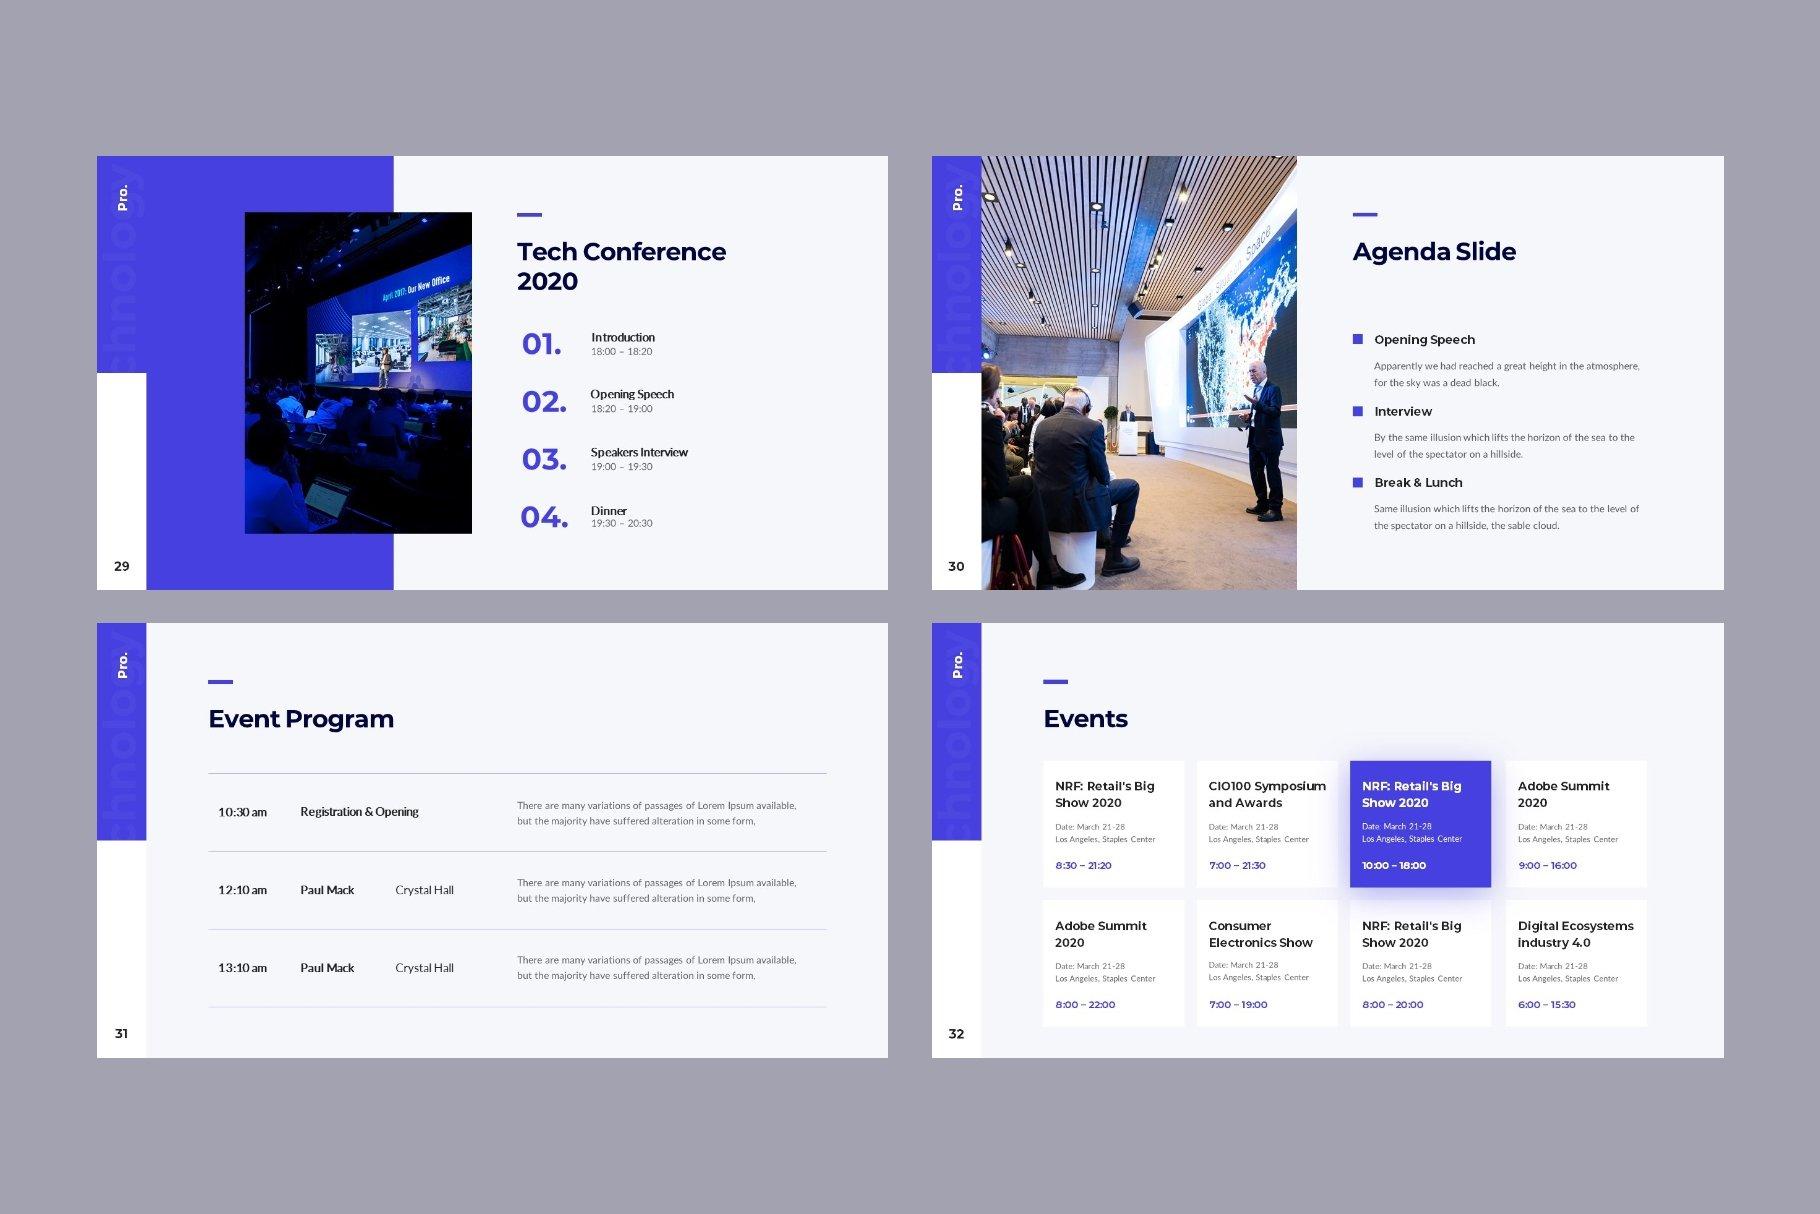 Slide with program and agenda.